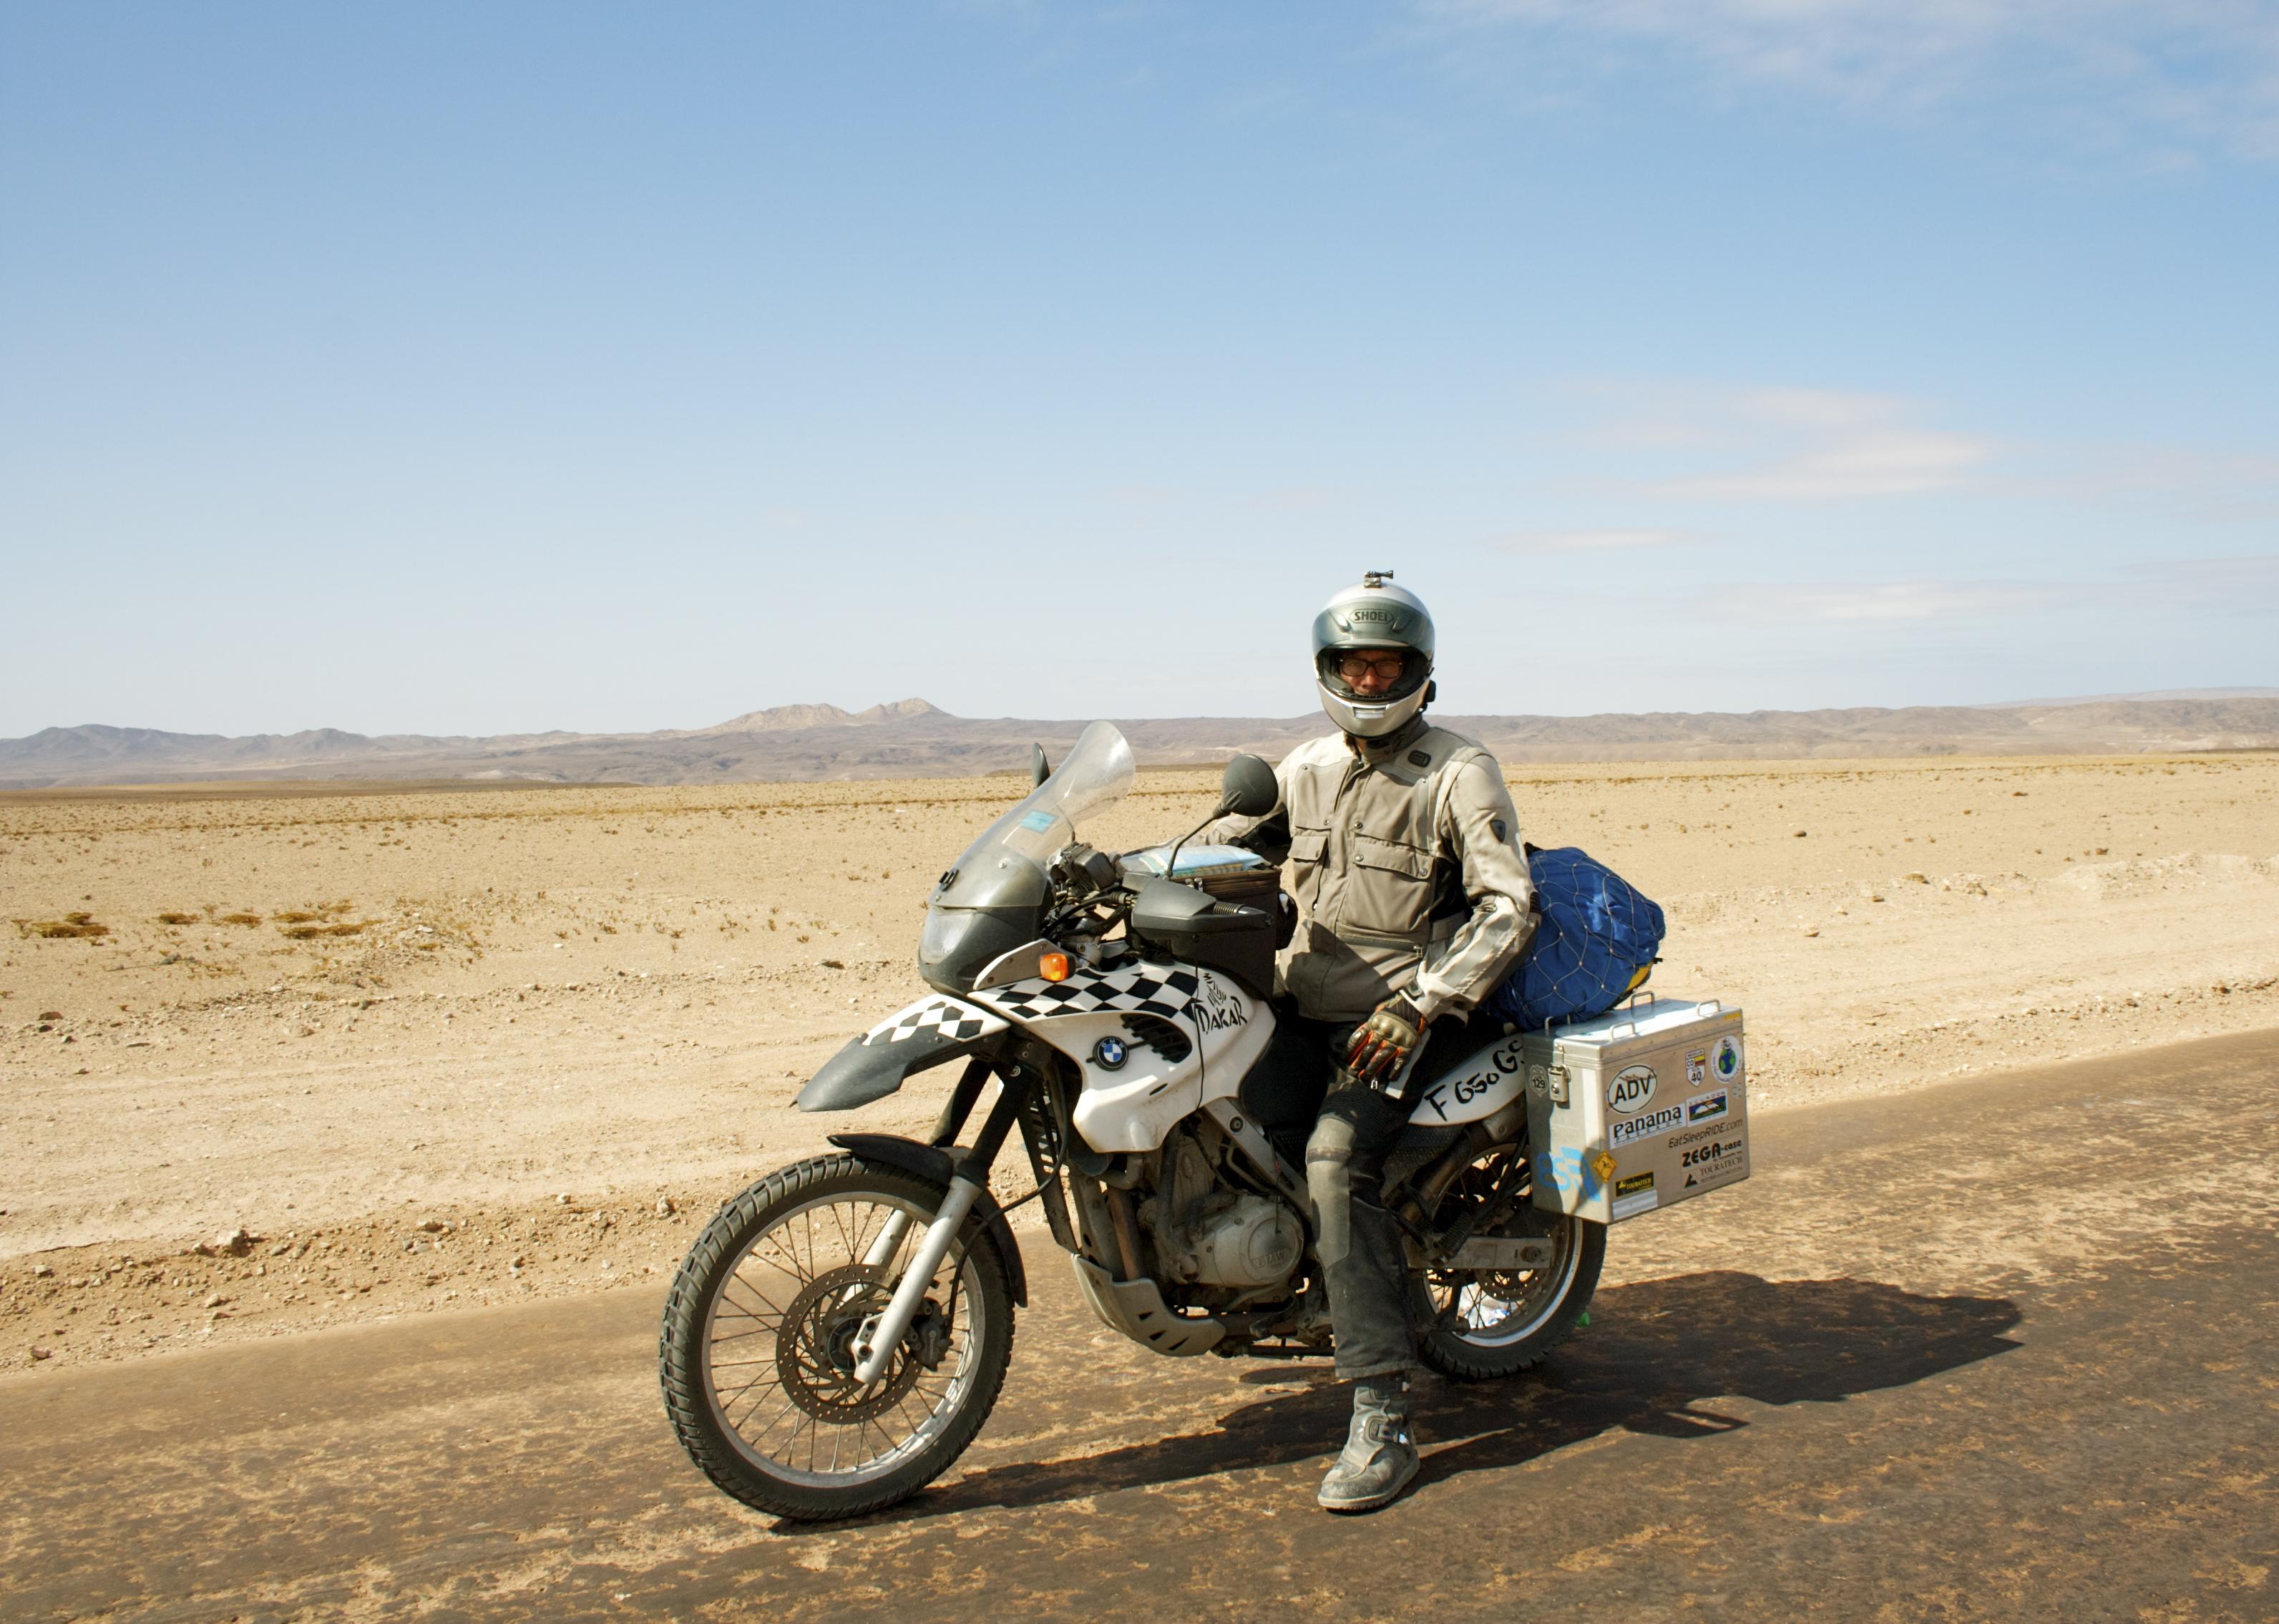 Choosing My Overland Travel Bike The 2000 Bmw F650gs Dakar